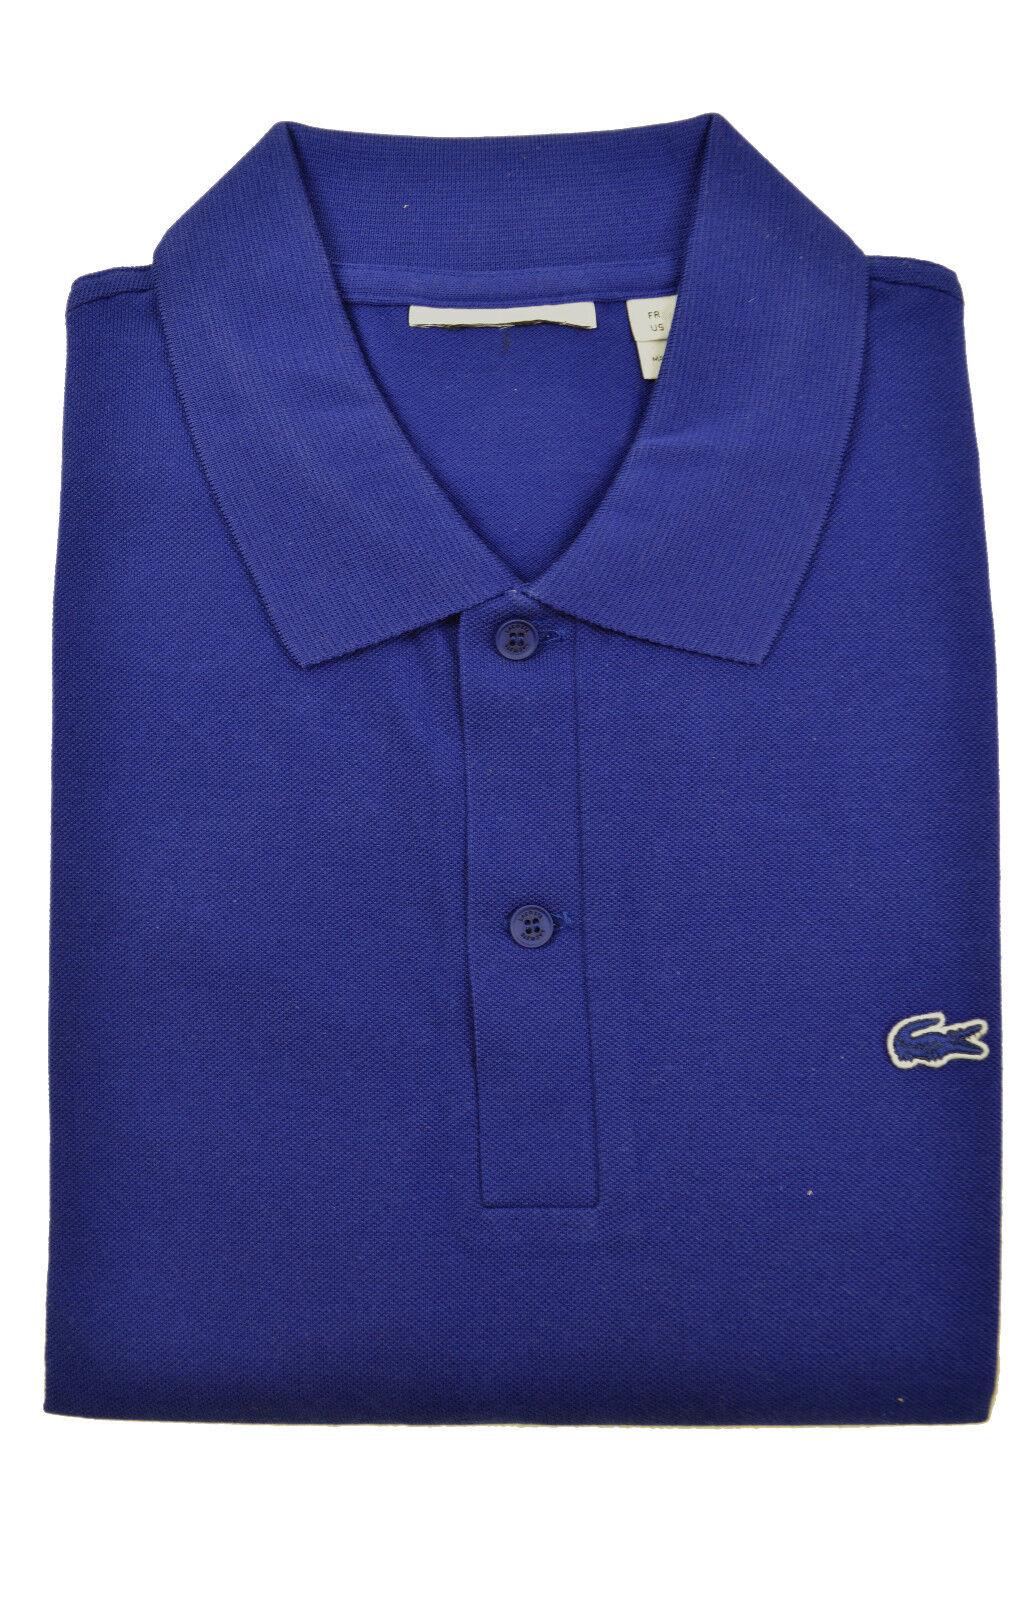 Lacoste Mens Royal Blue Color block Striped Pique Polo Shirt Sz Fr 3 Us Small S